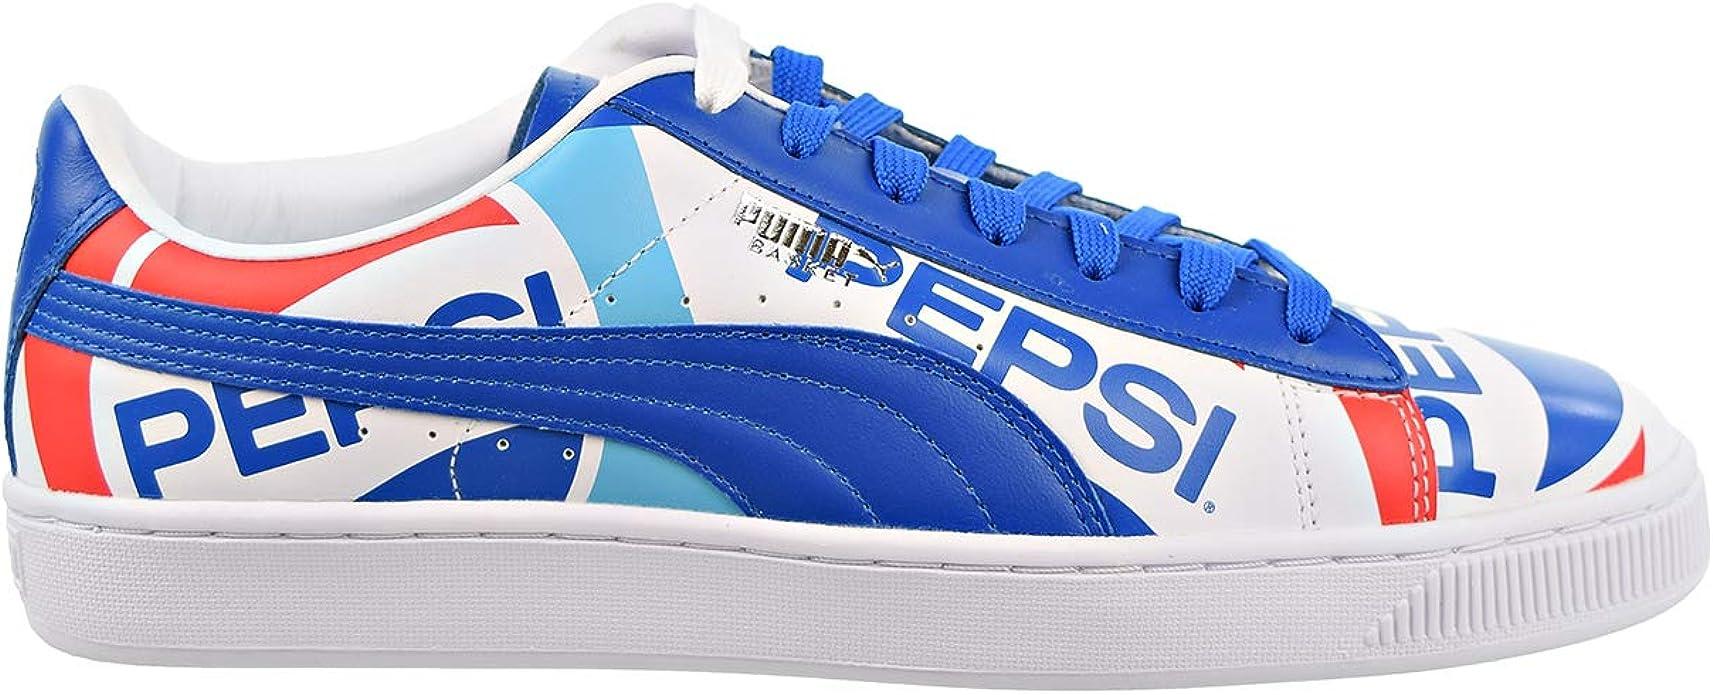 Situación cinta acelerador  Amazon.com | PUMA Mens Basket x Pepsi Casual Sneaker | Fashion Sneakers